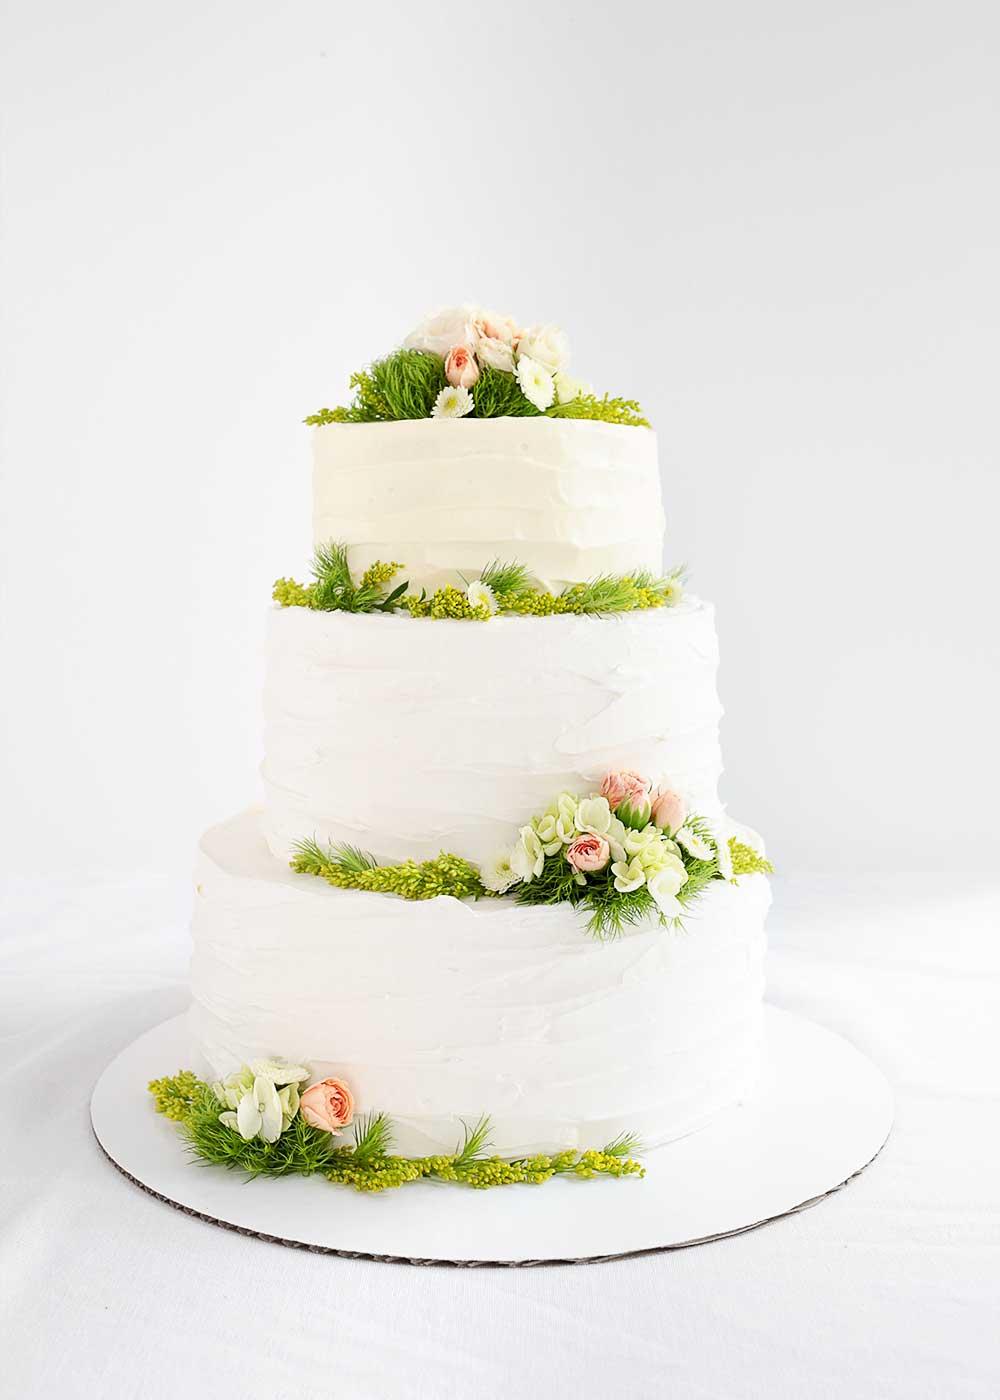 DIY Wedding Cake from The Fauxmartha